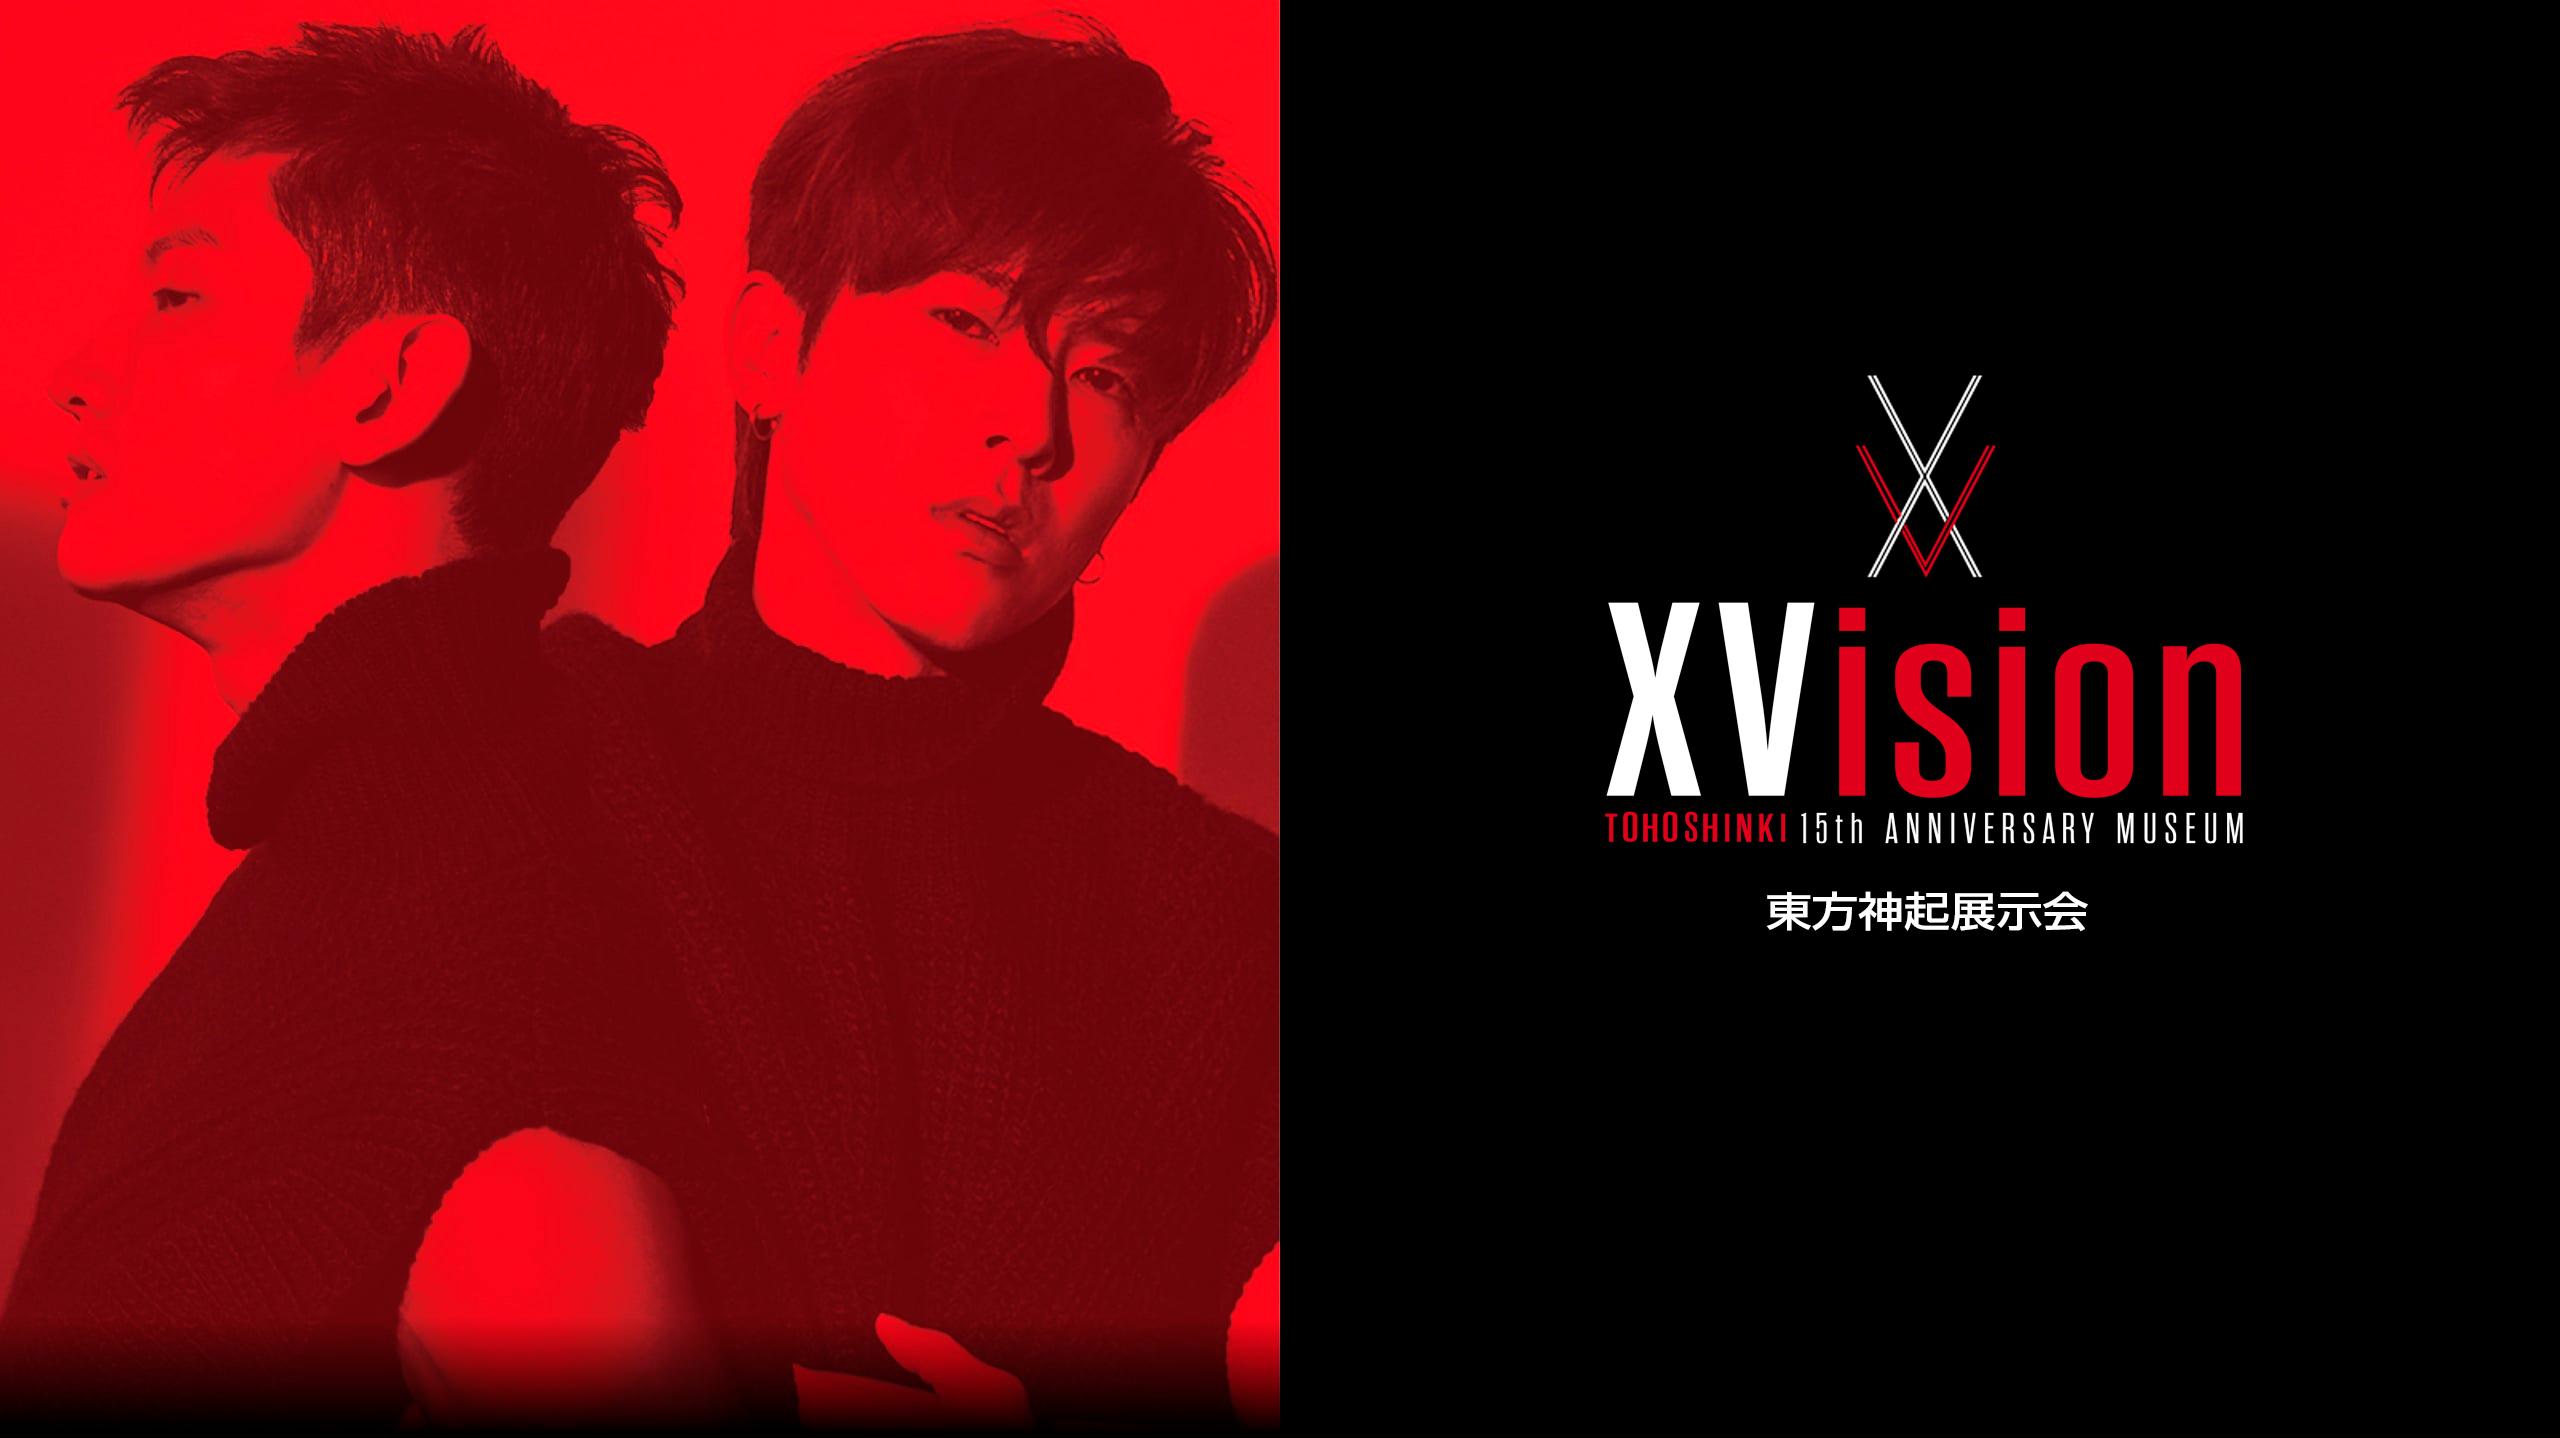 "【名古屋会場】TOHOSHINKI 15th ANNIVERSARY MUSEUM ""XVision"" 3月2日分入場券"